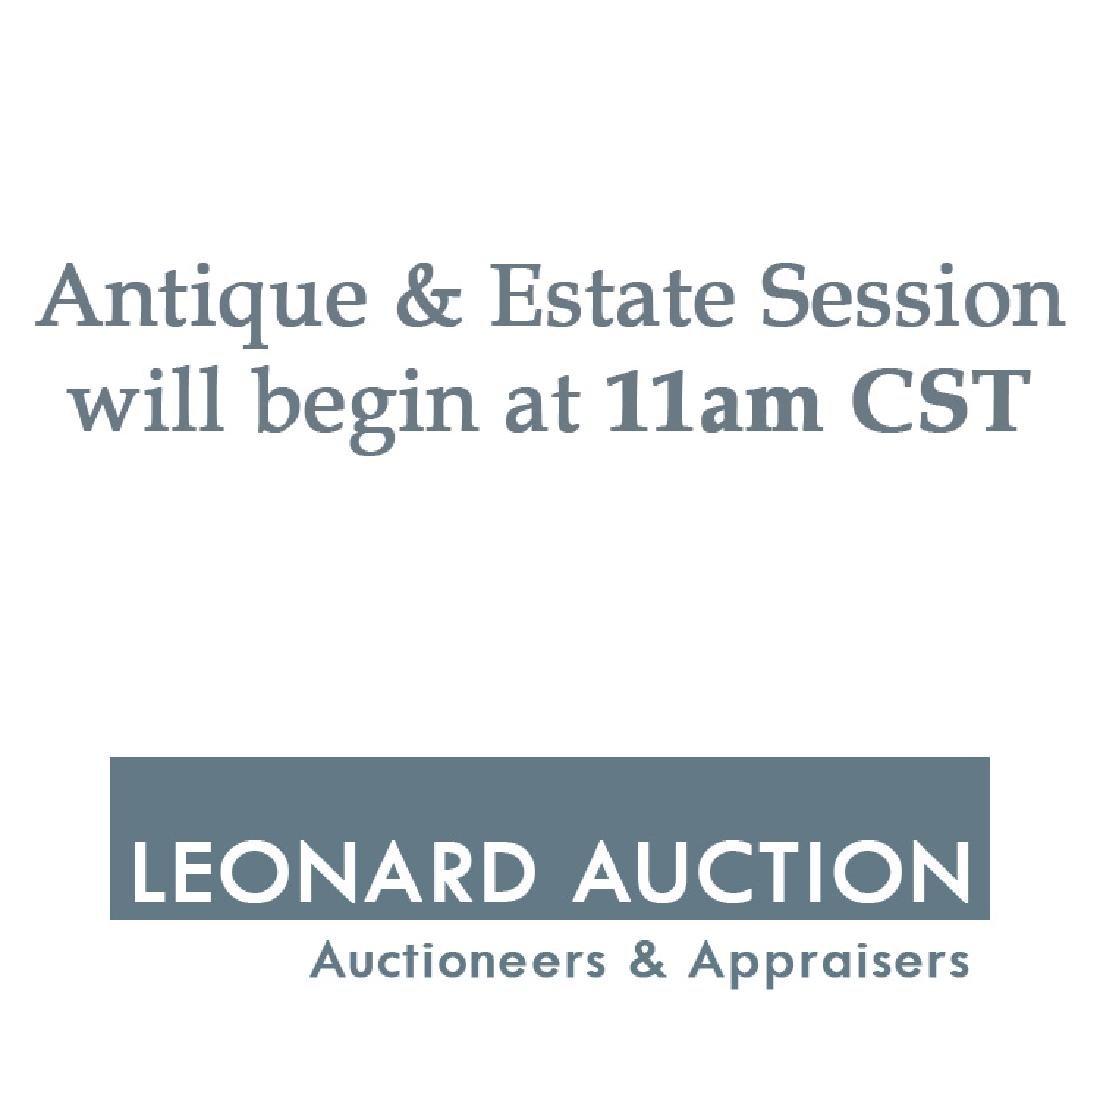 The Antique & Estate Session Begins at 11am CST